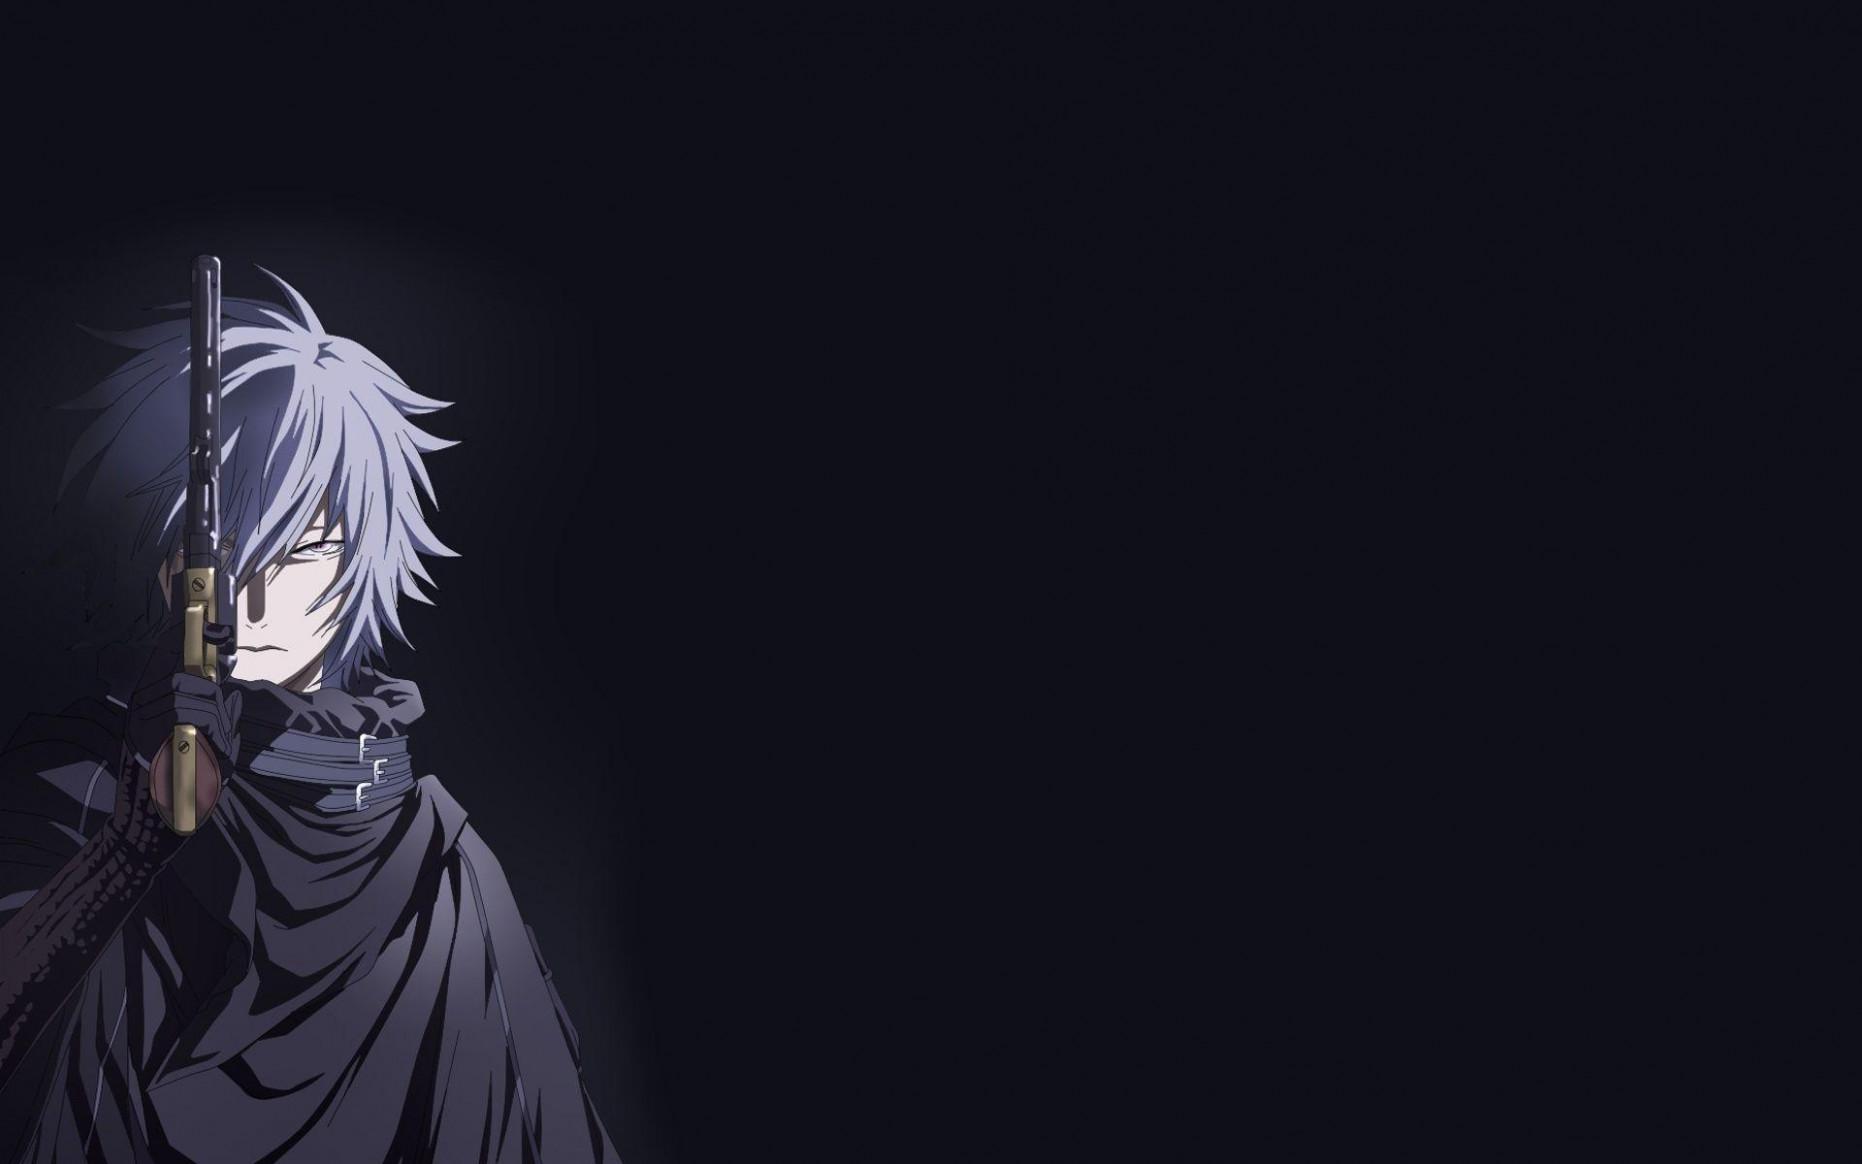 Gambar Wallpaper Anime Hd Paling Keren Wallpaper O